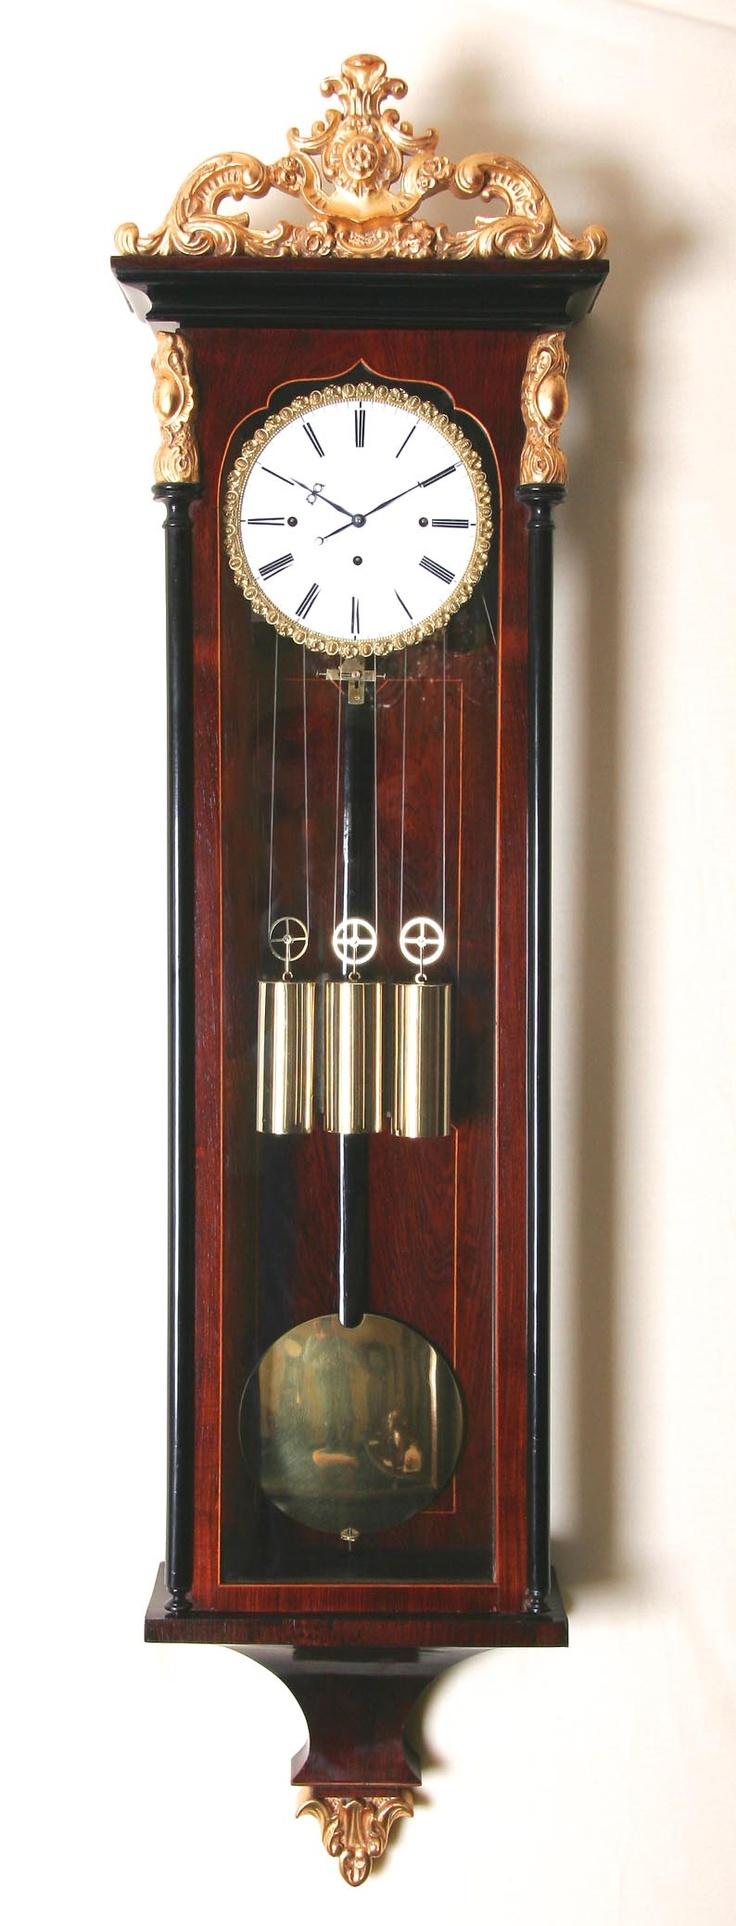 Vintage Vienna Regulator clock.